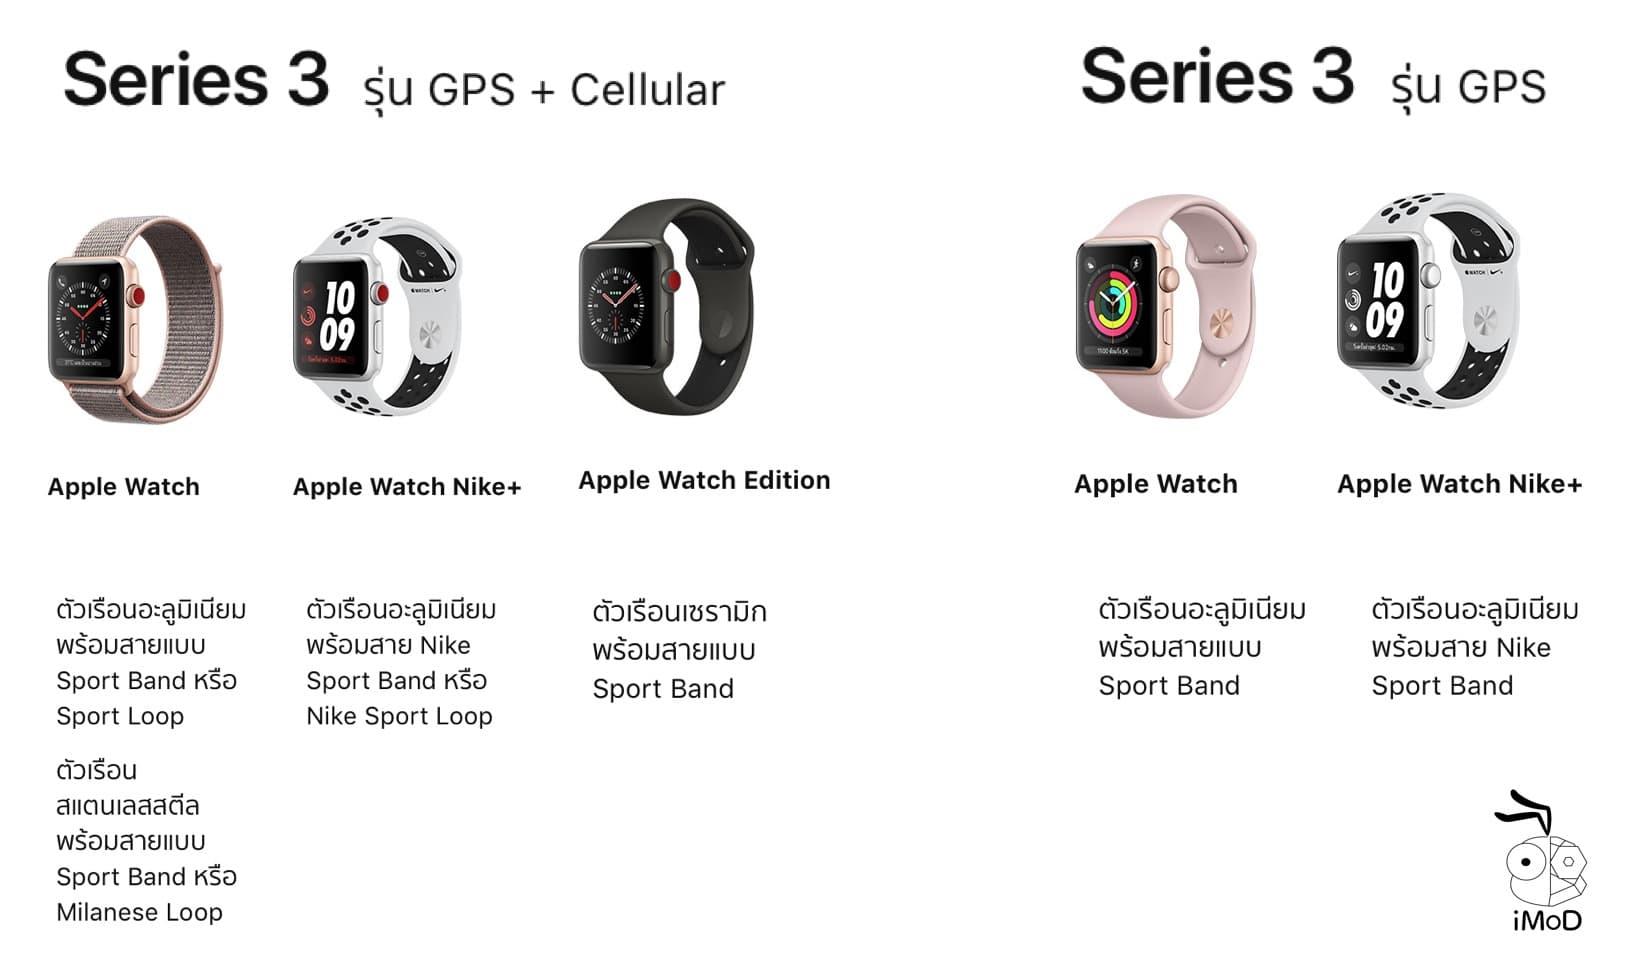 Apple Watch Series 3 Gps Vs Cellular